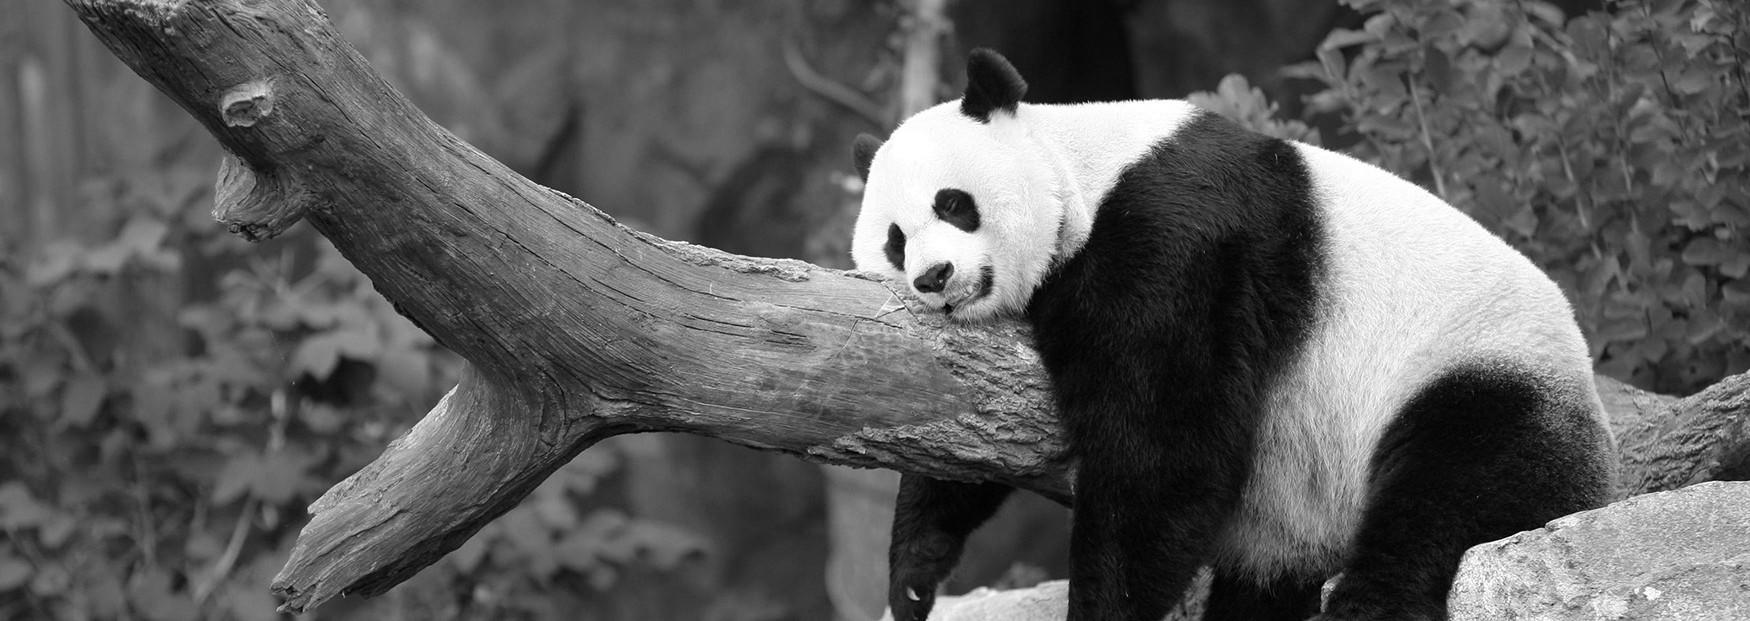 Panda 4.0 – New Algorithm Update